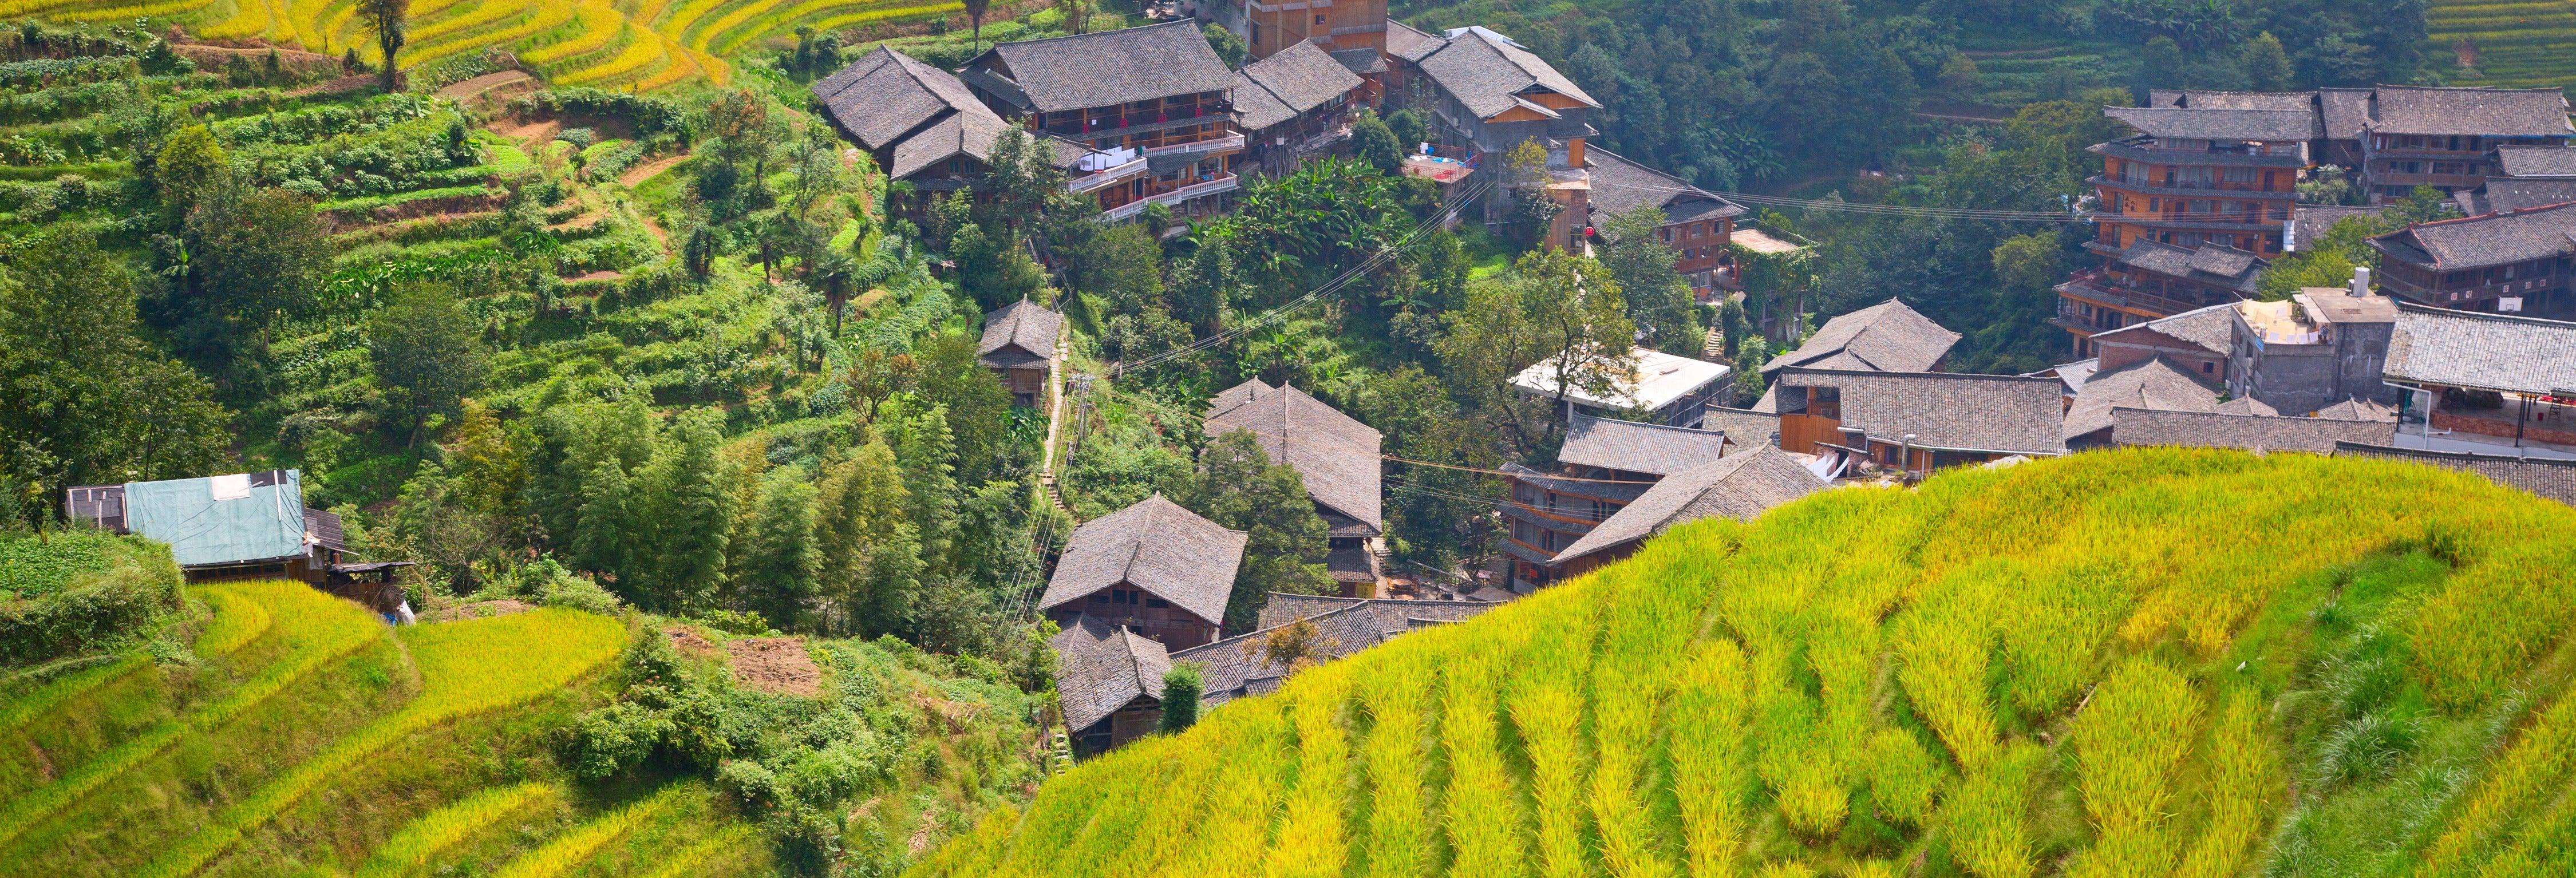 Rice Terraces Private Tour